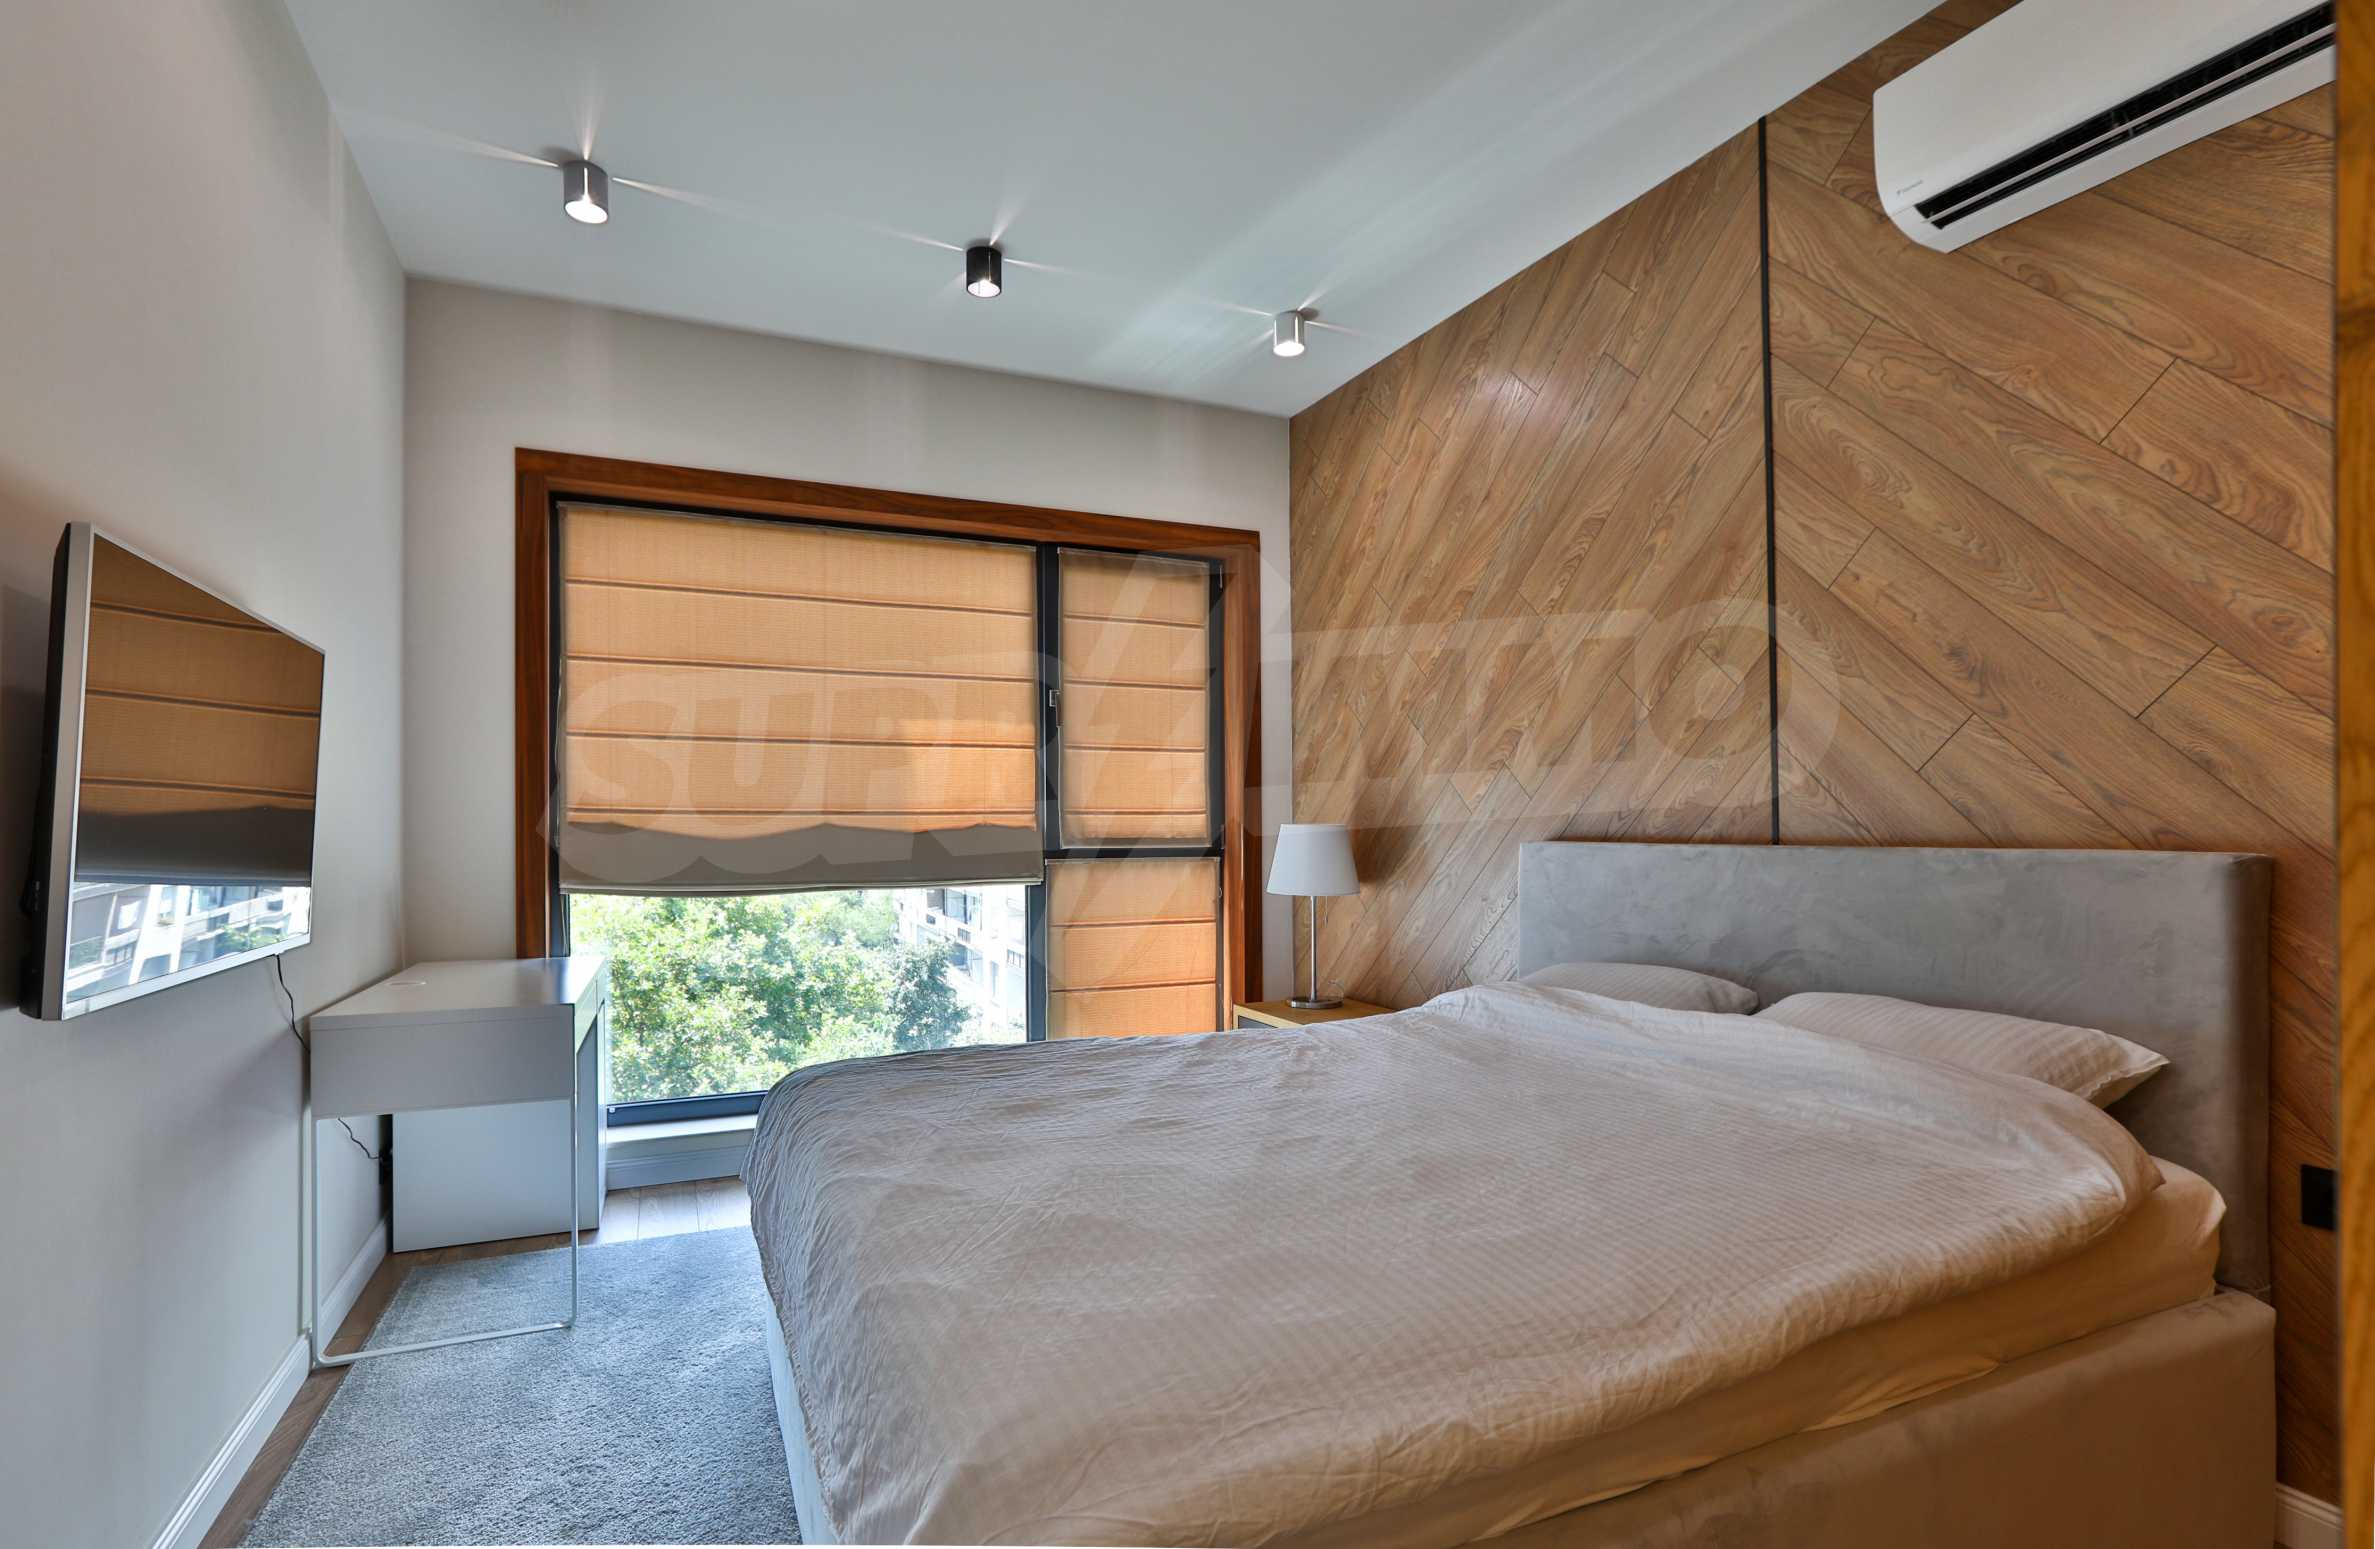 Дизайнерски обзаведен многостаен апартамент 11